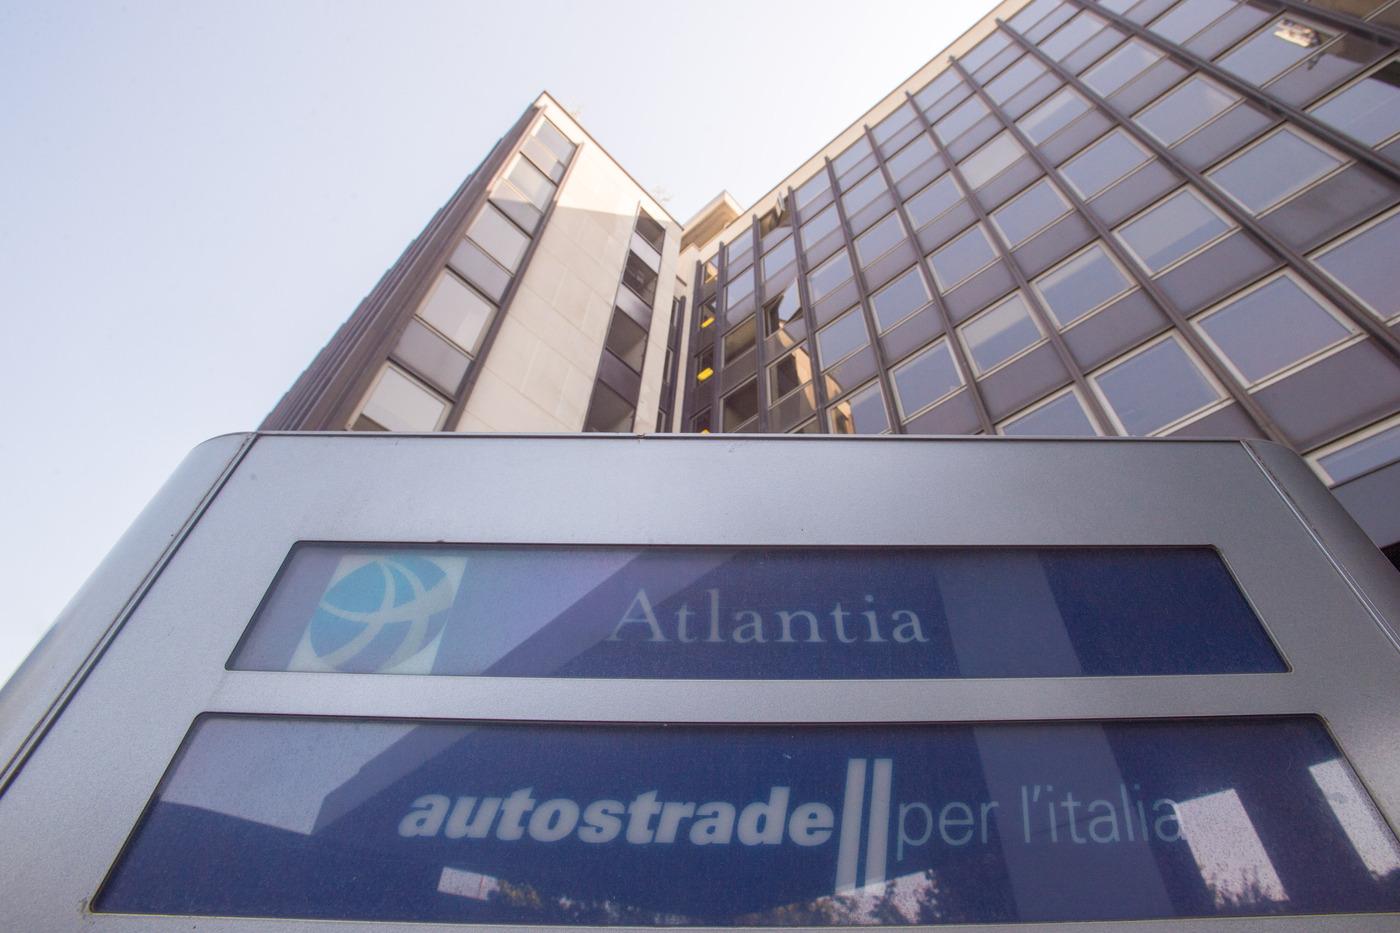 CdP e i fondi Macquarie e Blackstone: pronta l'offerta per l'88% di Atlantia in Autostrade